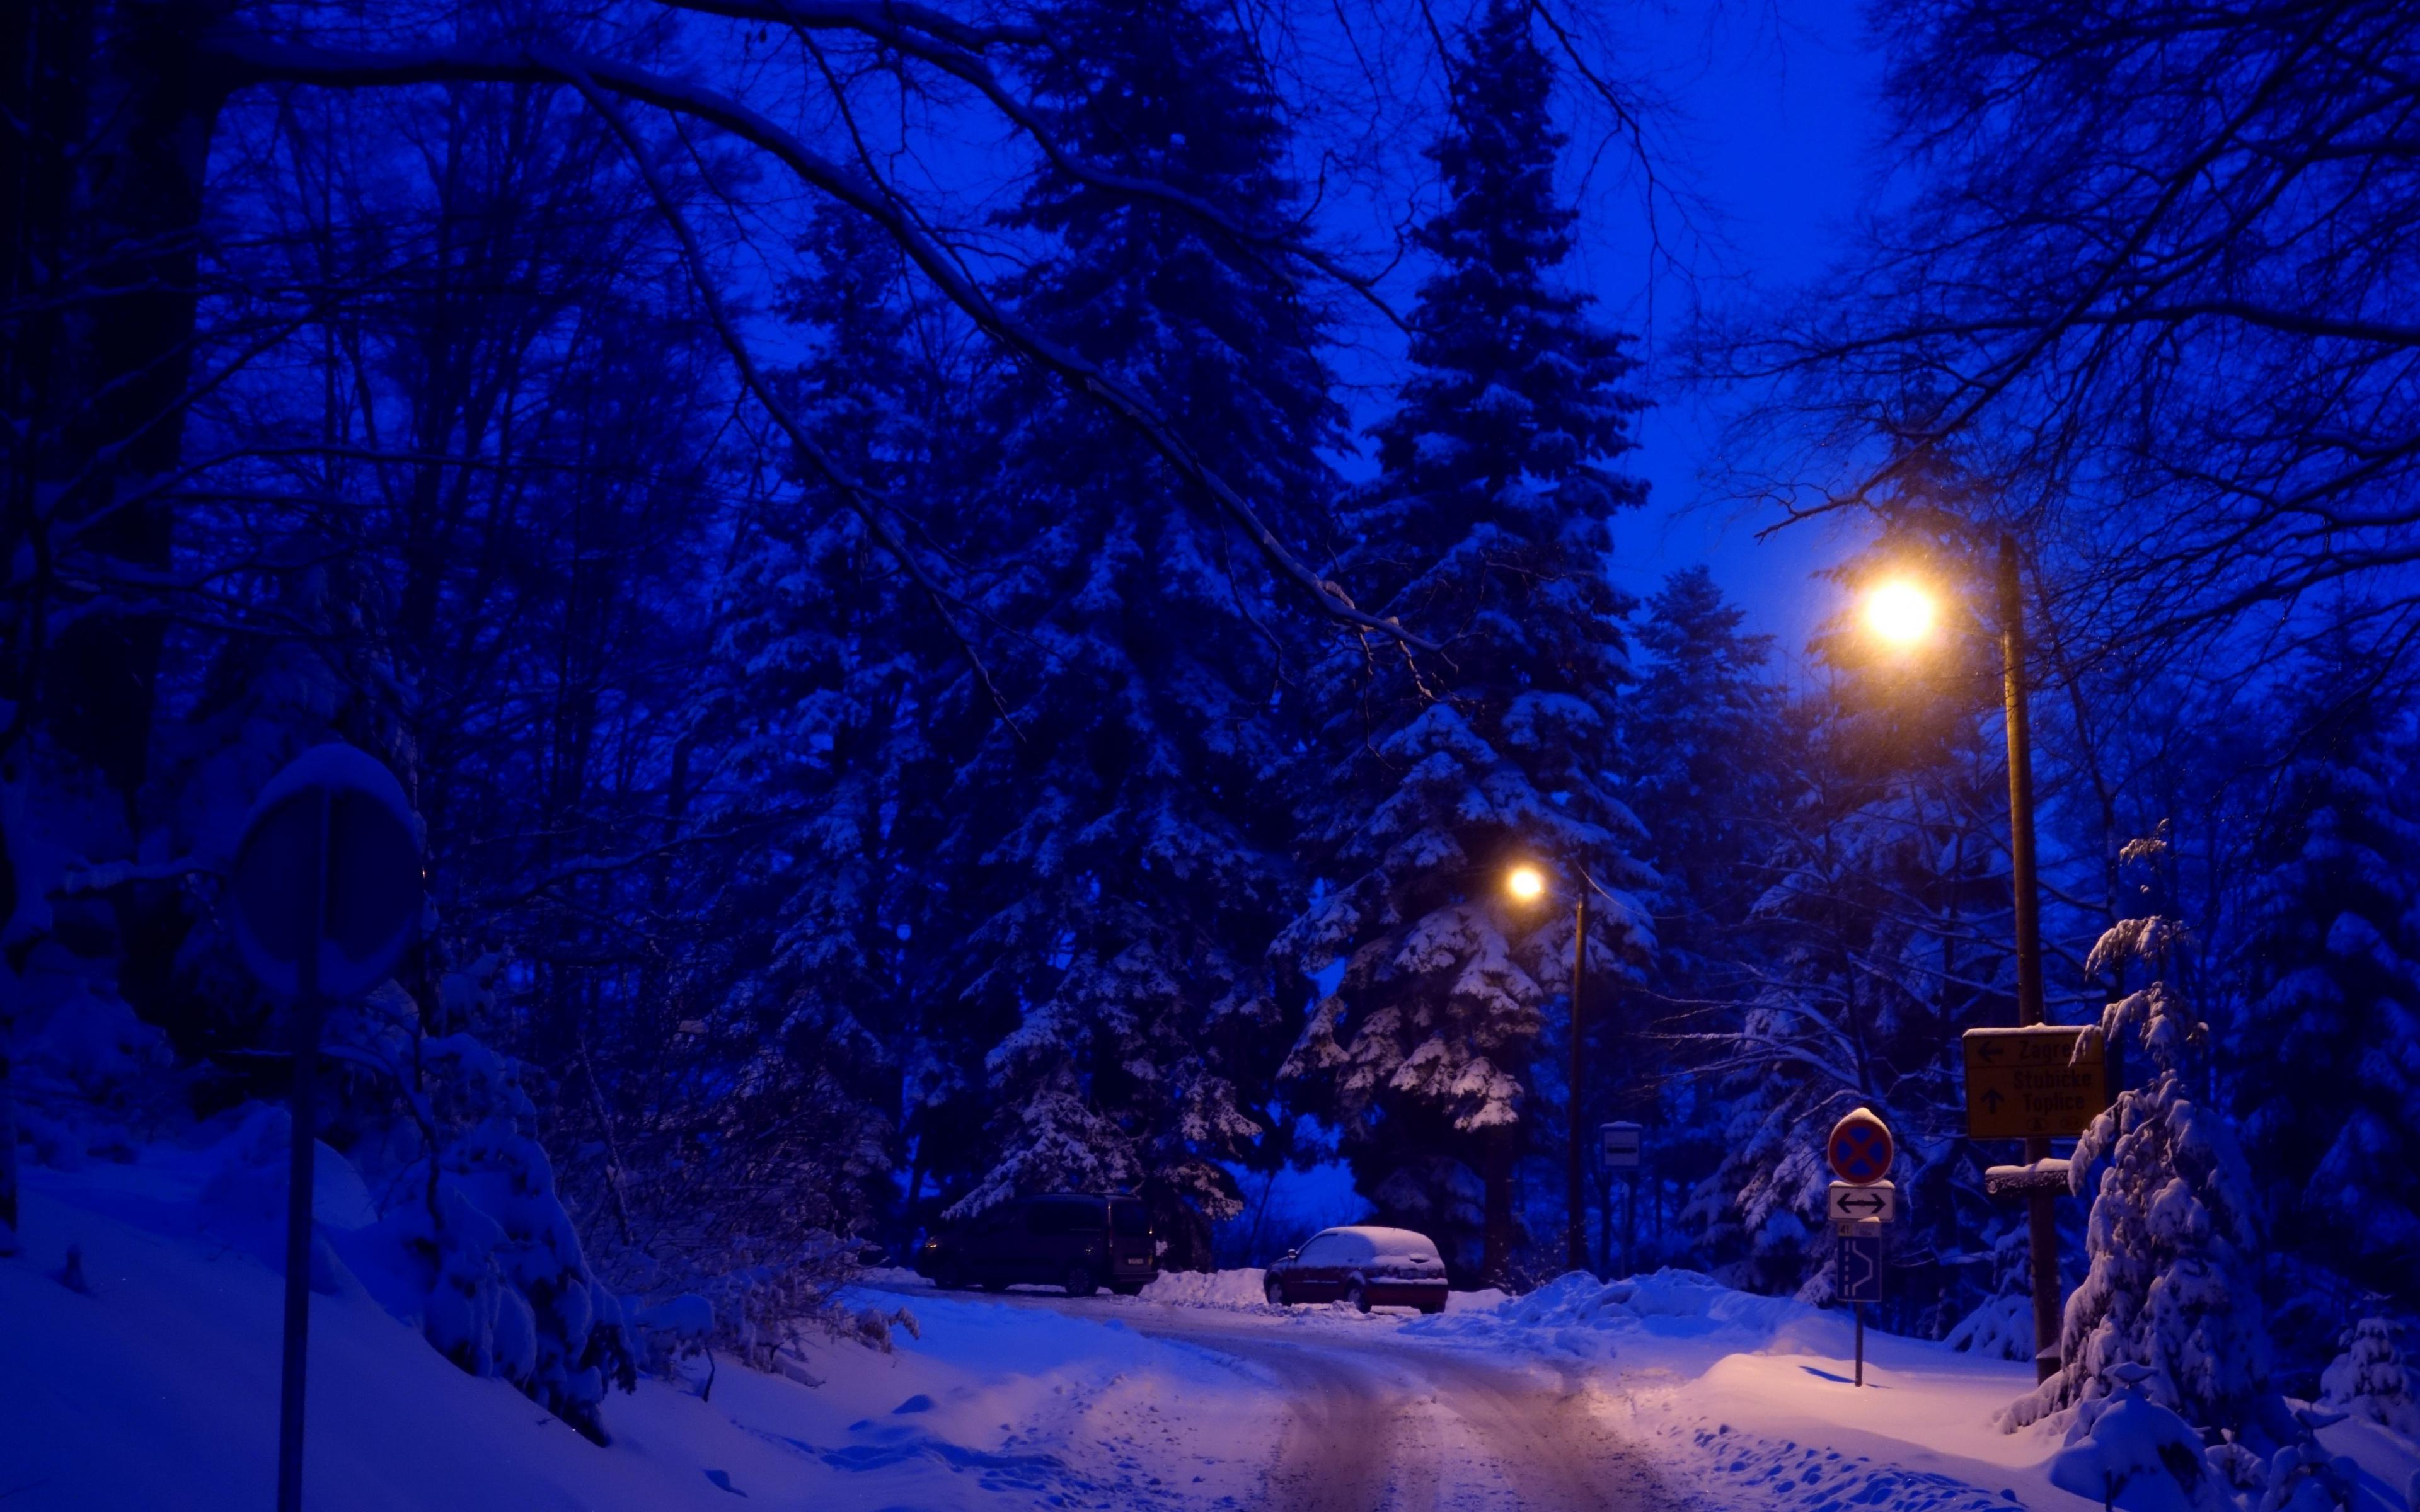 Download 3840x2400 Wallpaper Winter Night Street Lights